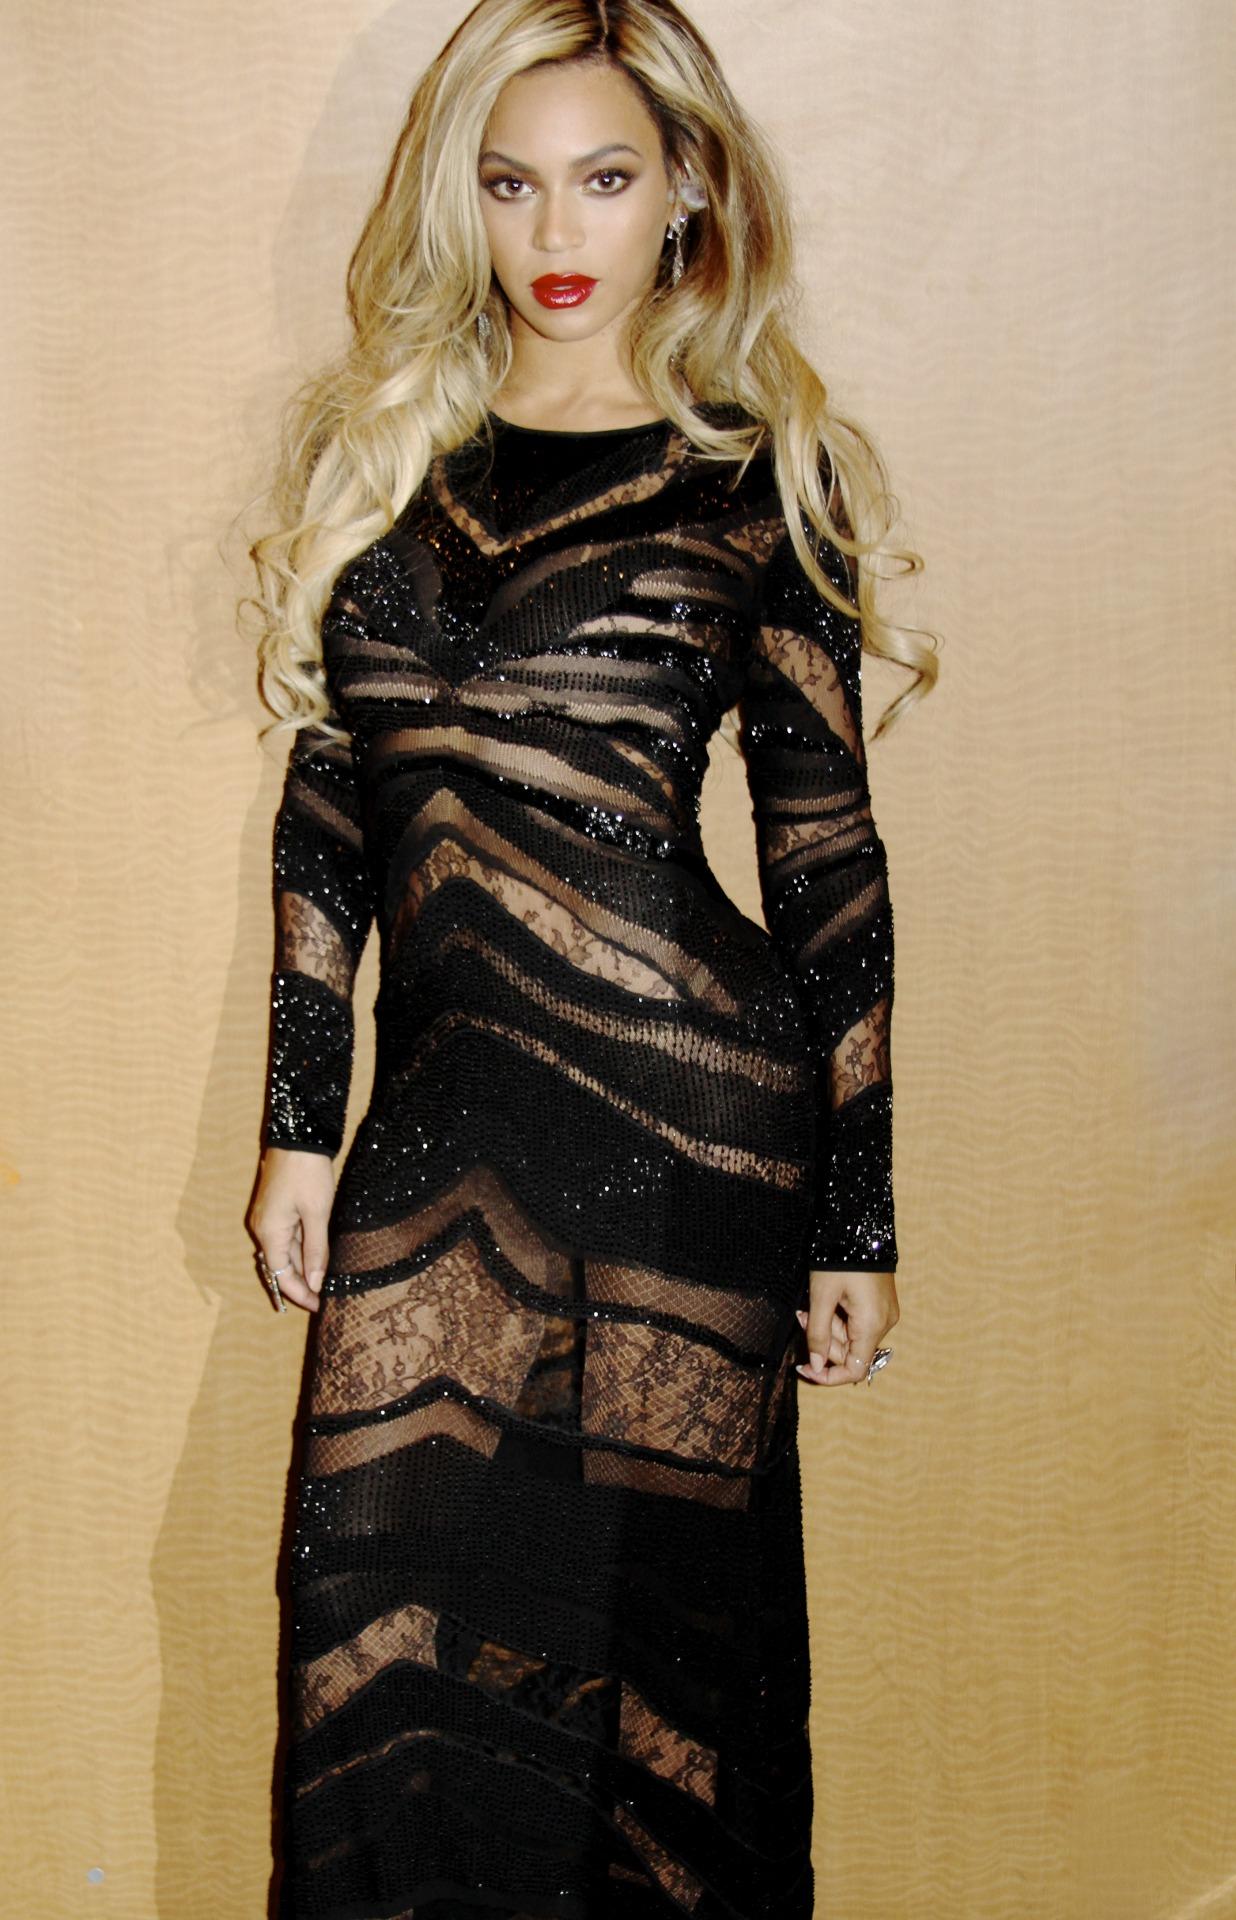 Beyoncé - Twitter (@Beyonce), Instagram (Baddiebey), Tumblr (I Am...) [II] - Página 2 Tumblr_n0i2prOvAC1rqgjz2o1_1280